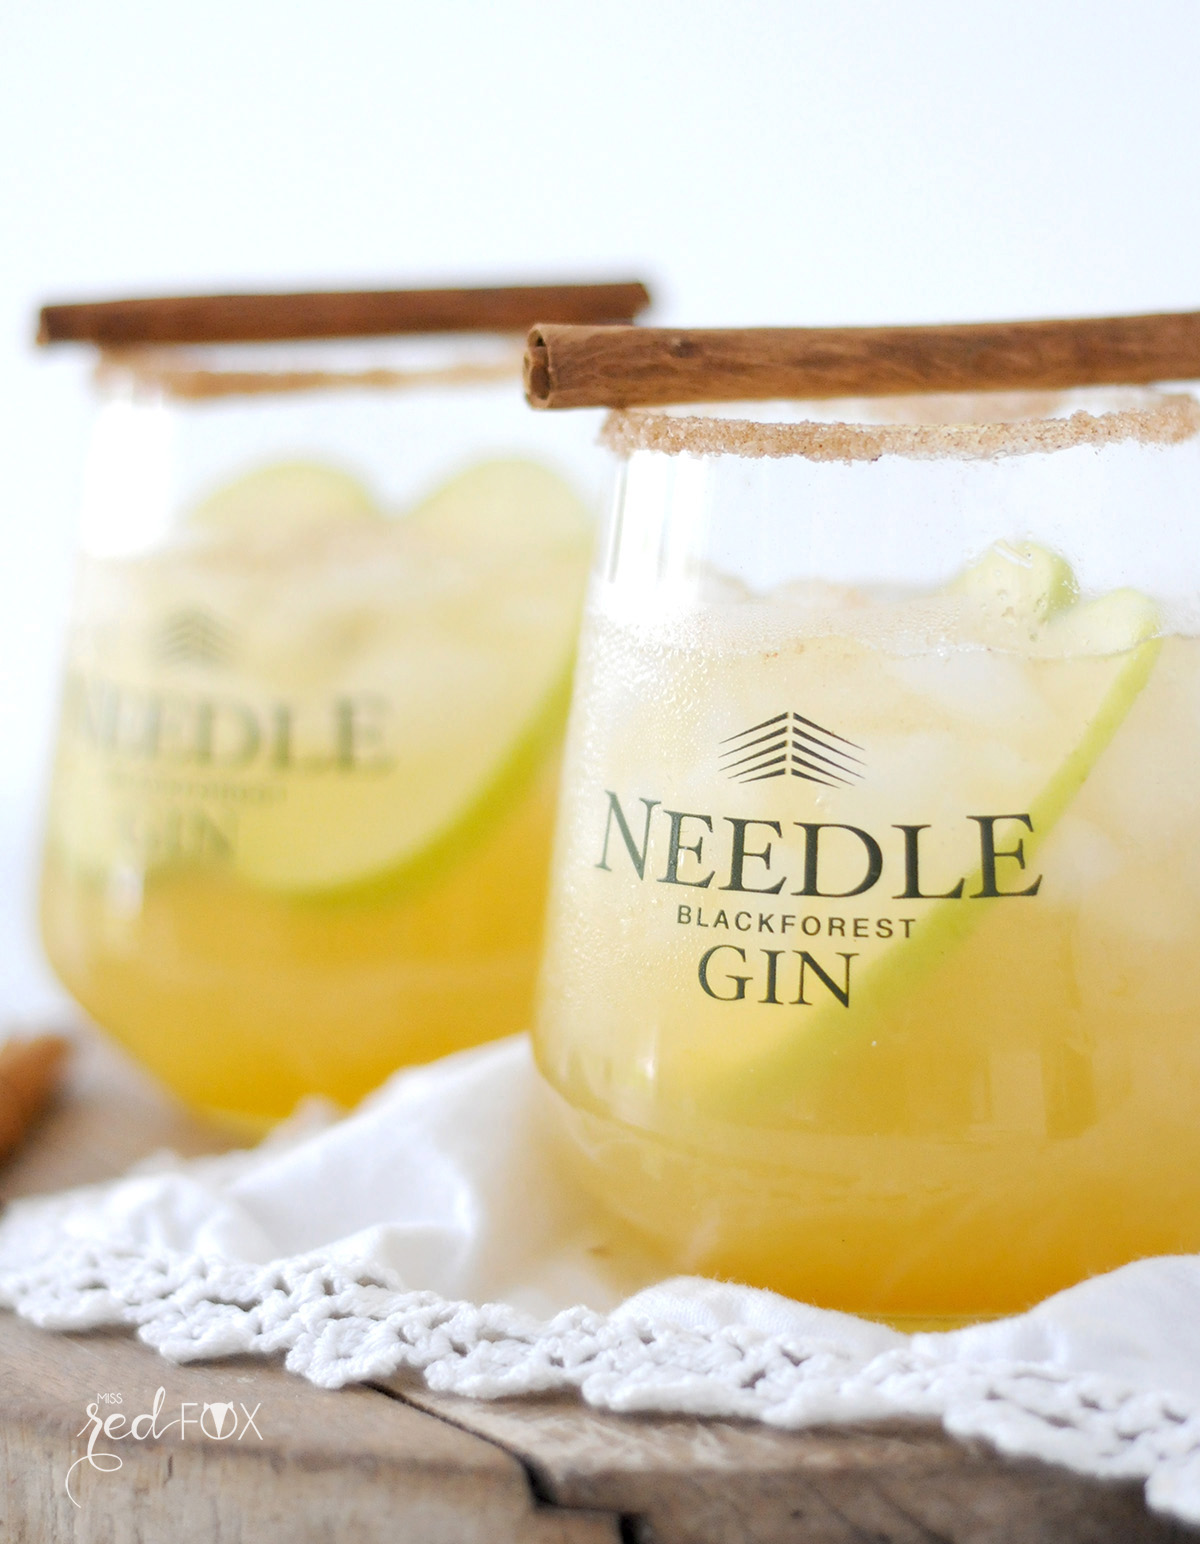 missredfox - Needle Gin - Cocktail mit Apfel Honig Zimt - 09